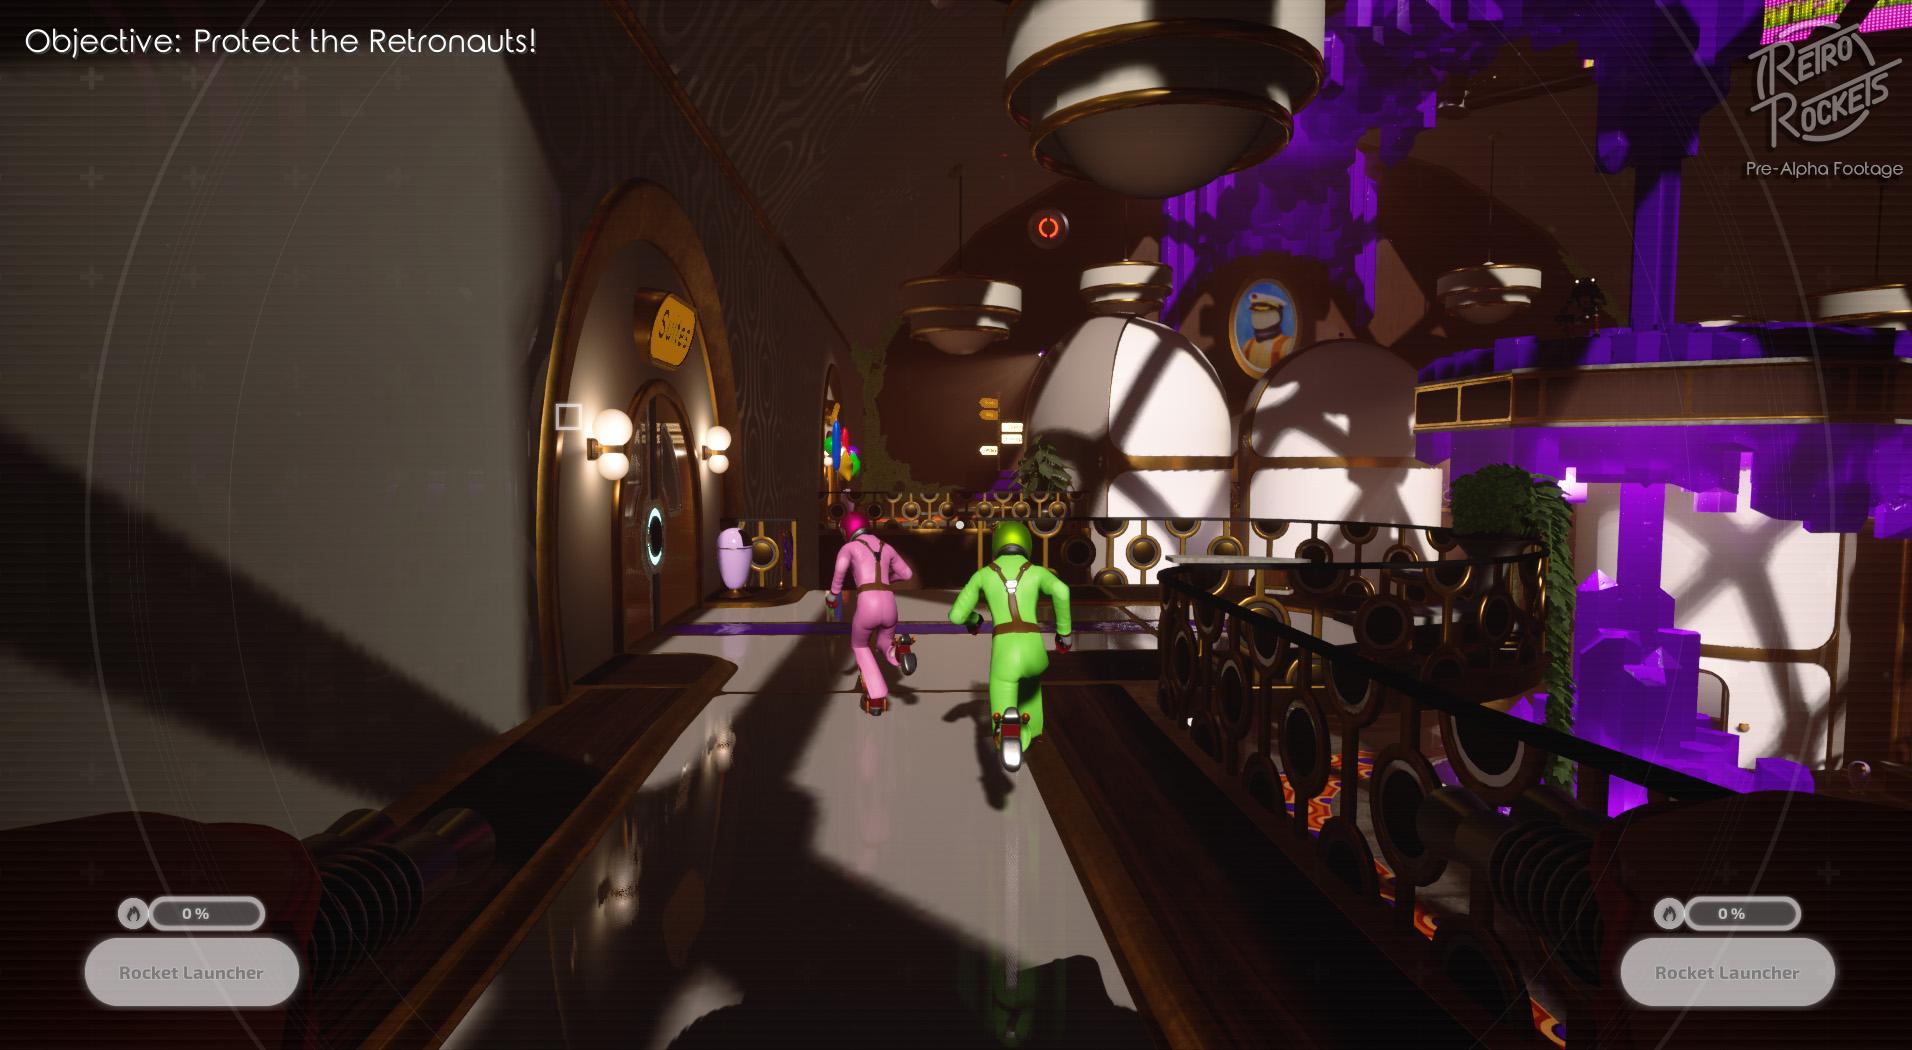 gameplayScreenshot_05.jpg